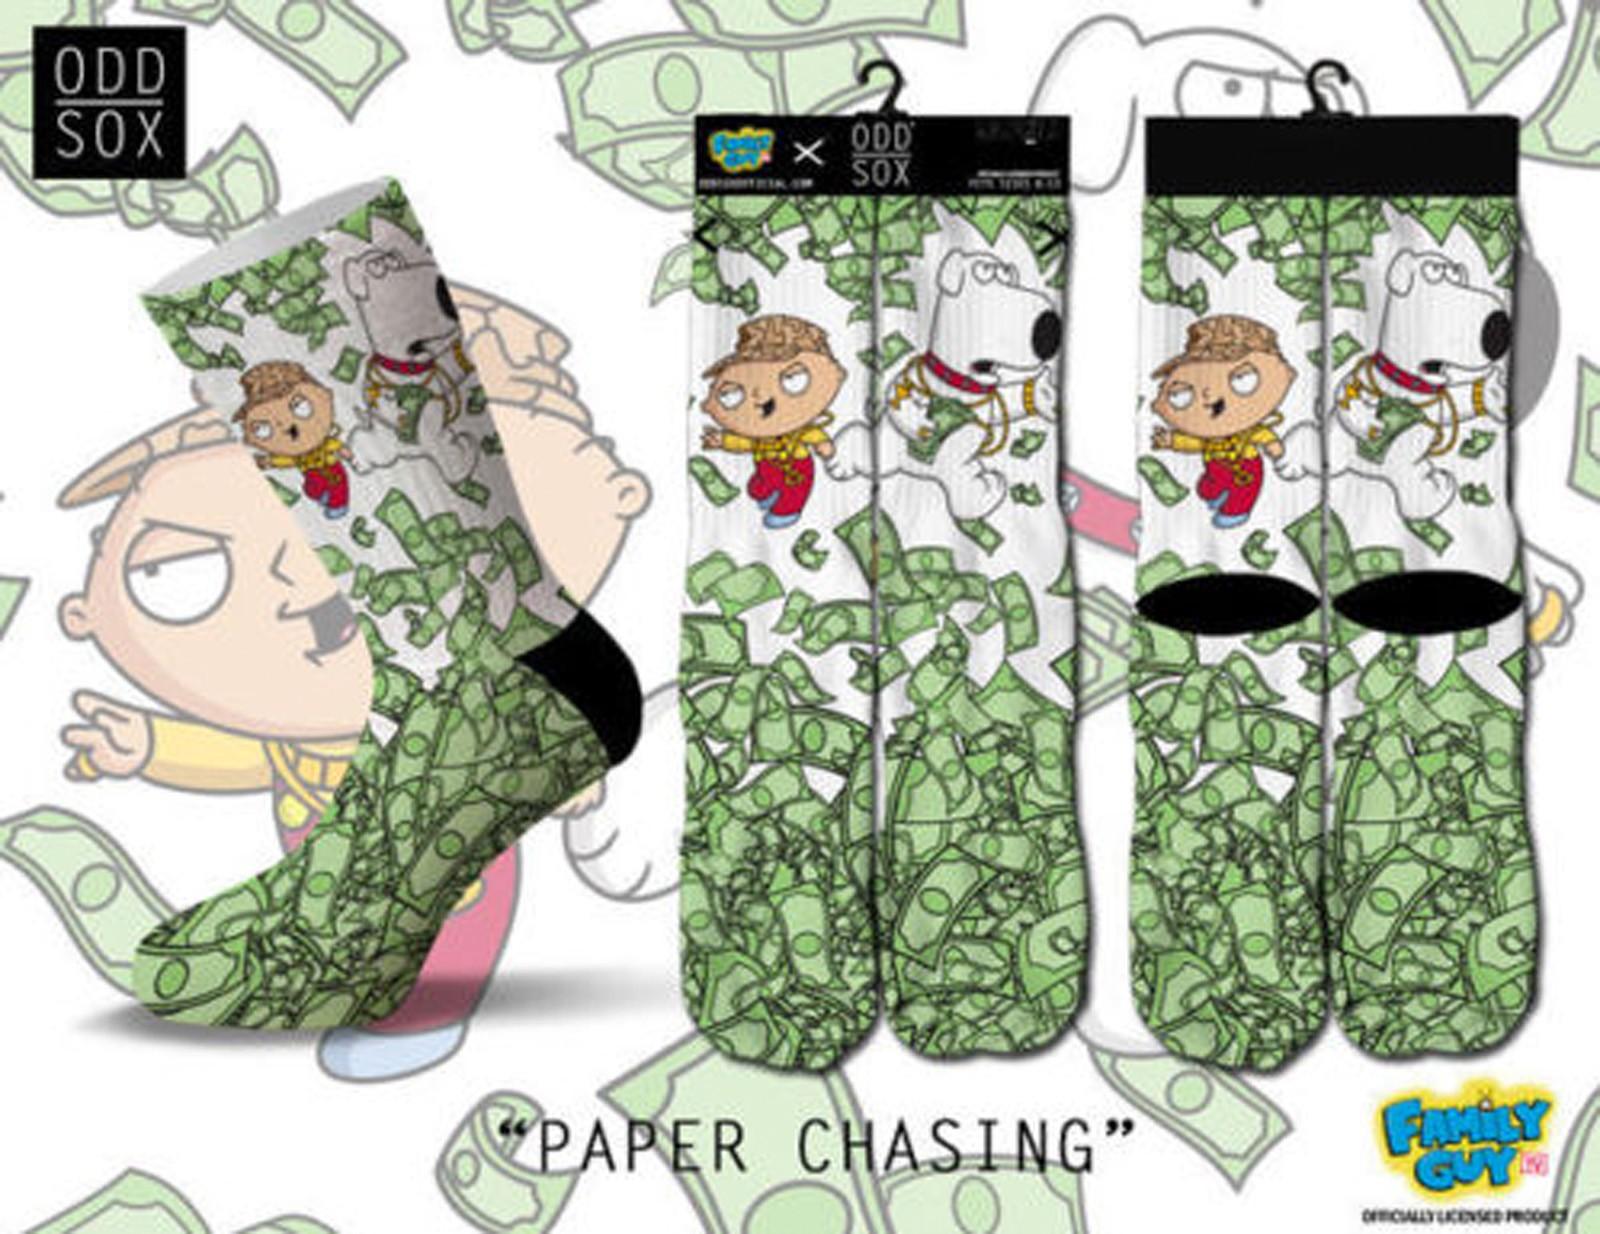 ODD Sox - Family Guy Edition Paper Chasing Socken